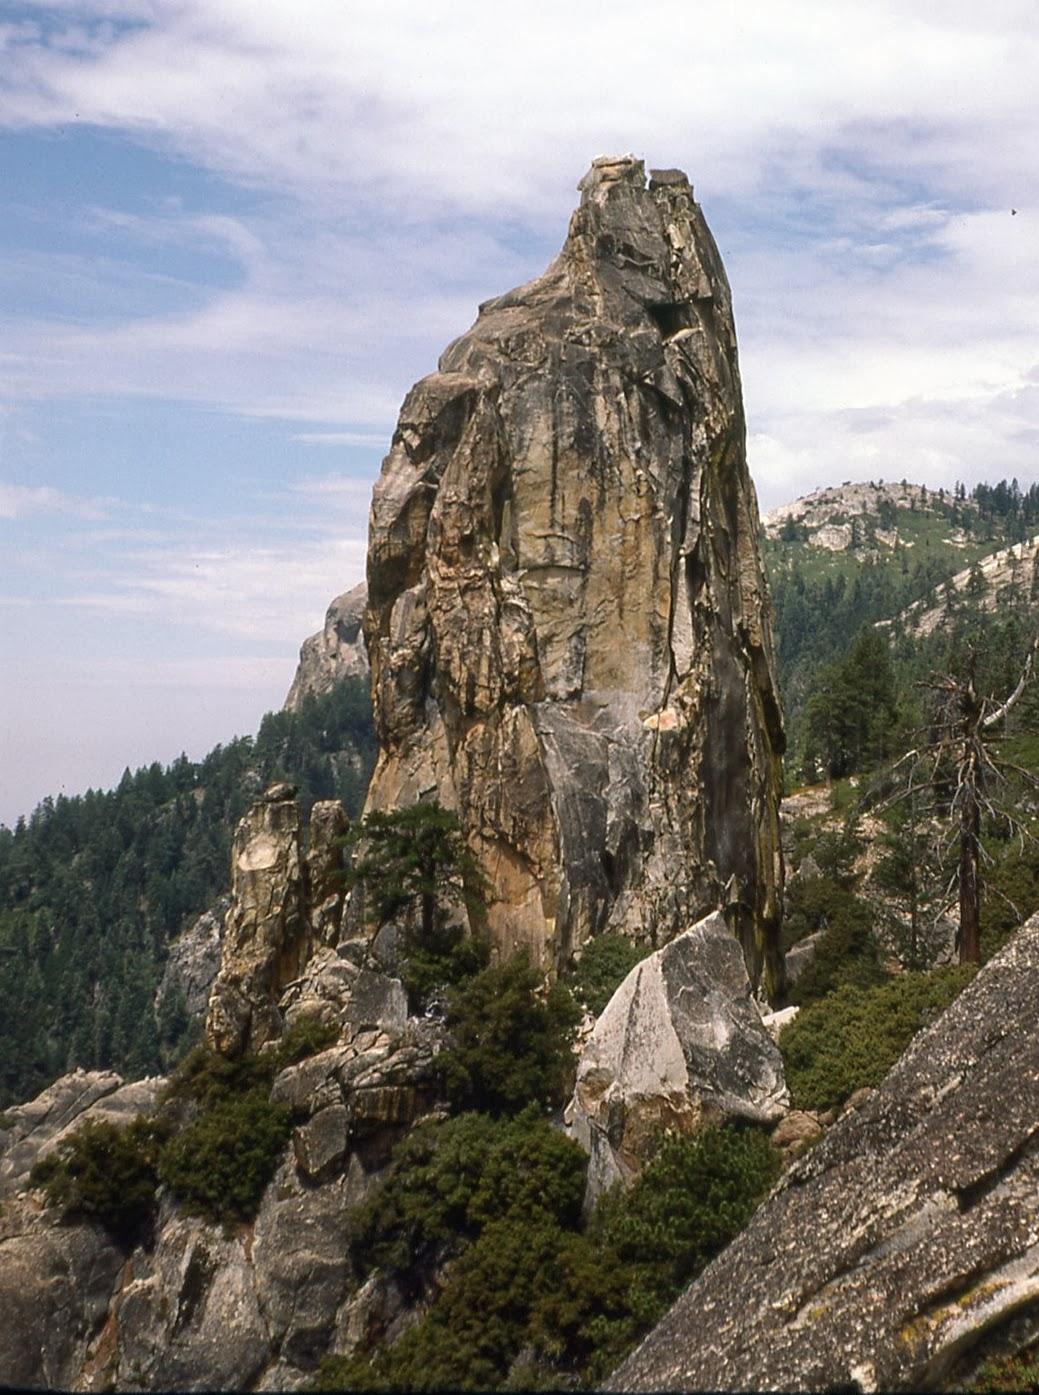 Chimney Rock Spire